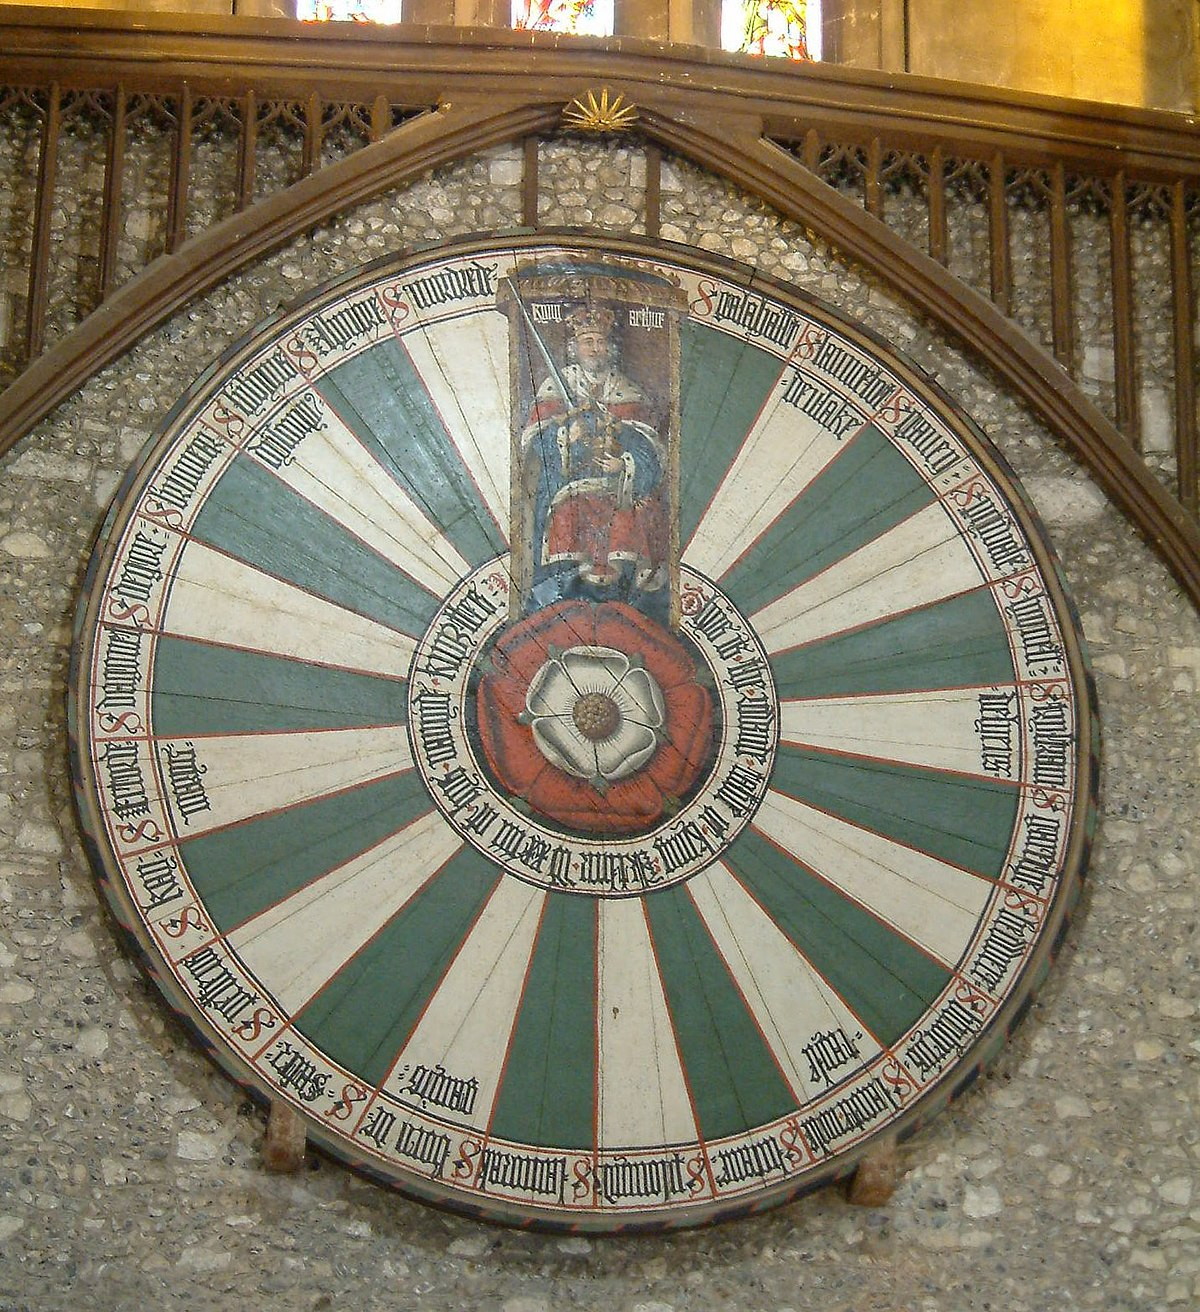 Koning Arthur Ronde Tafel.Orde Van De Ronde Tafel Wikipedia